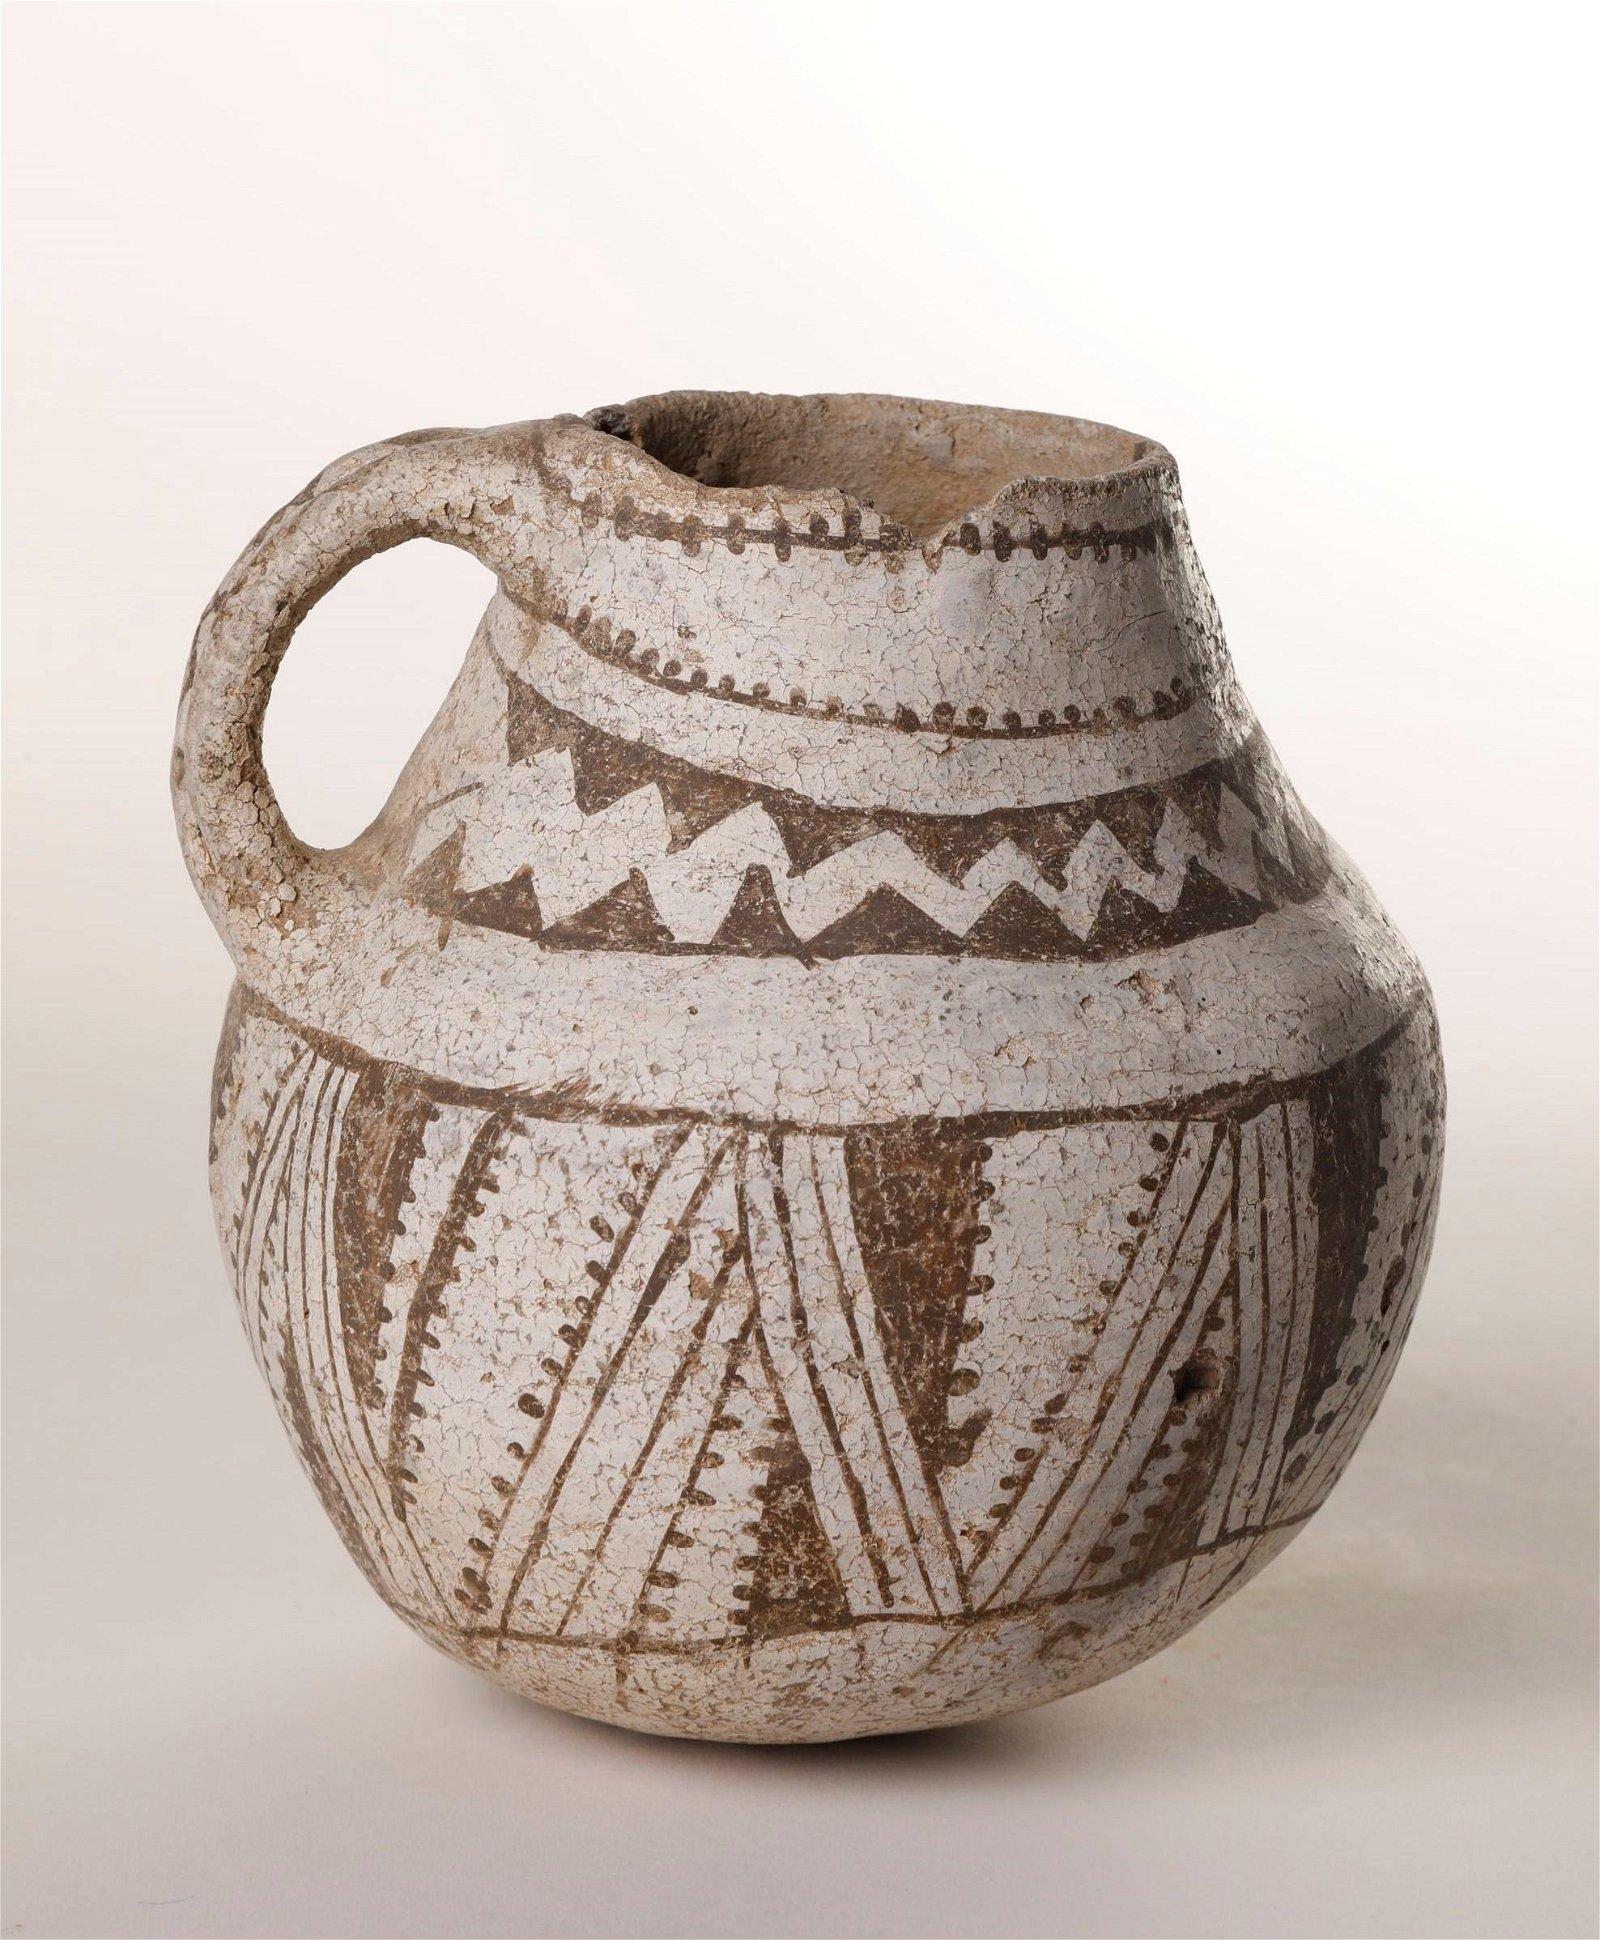 Anasazi, Kana-a, Pottery Pitcher, ca. 800-875